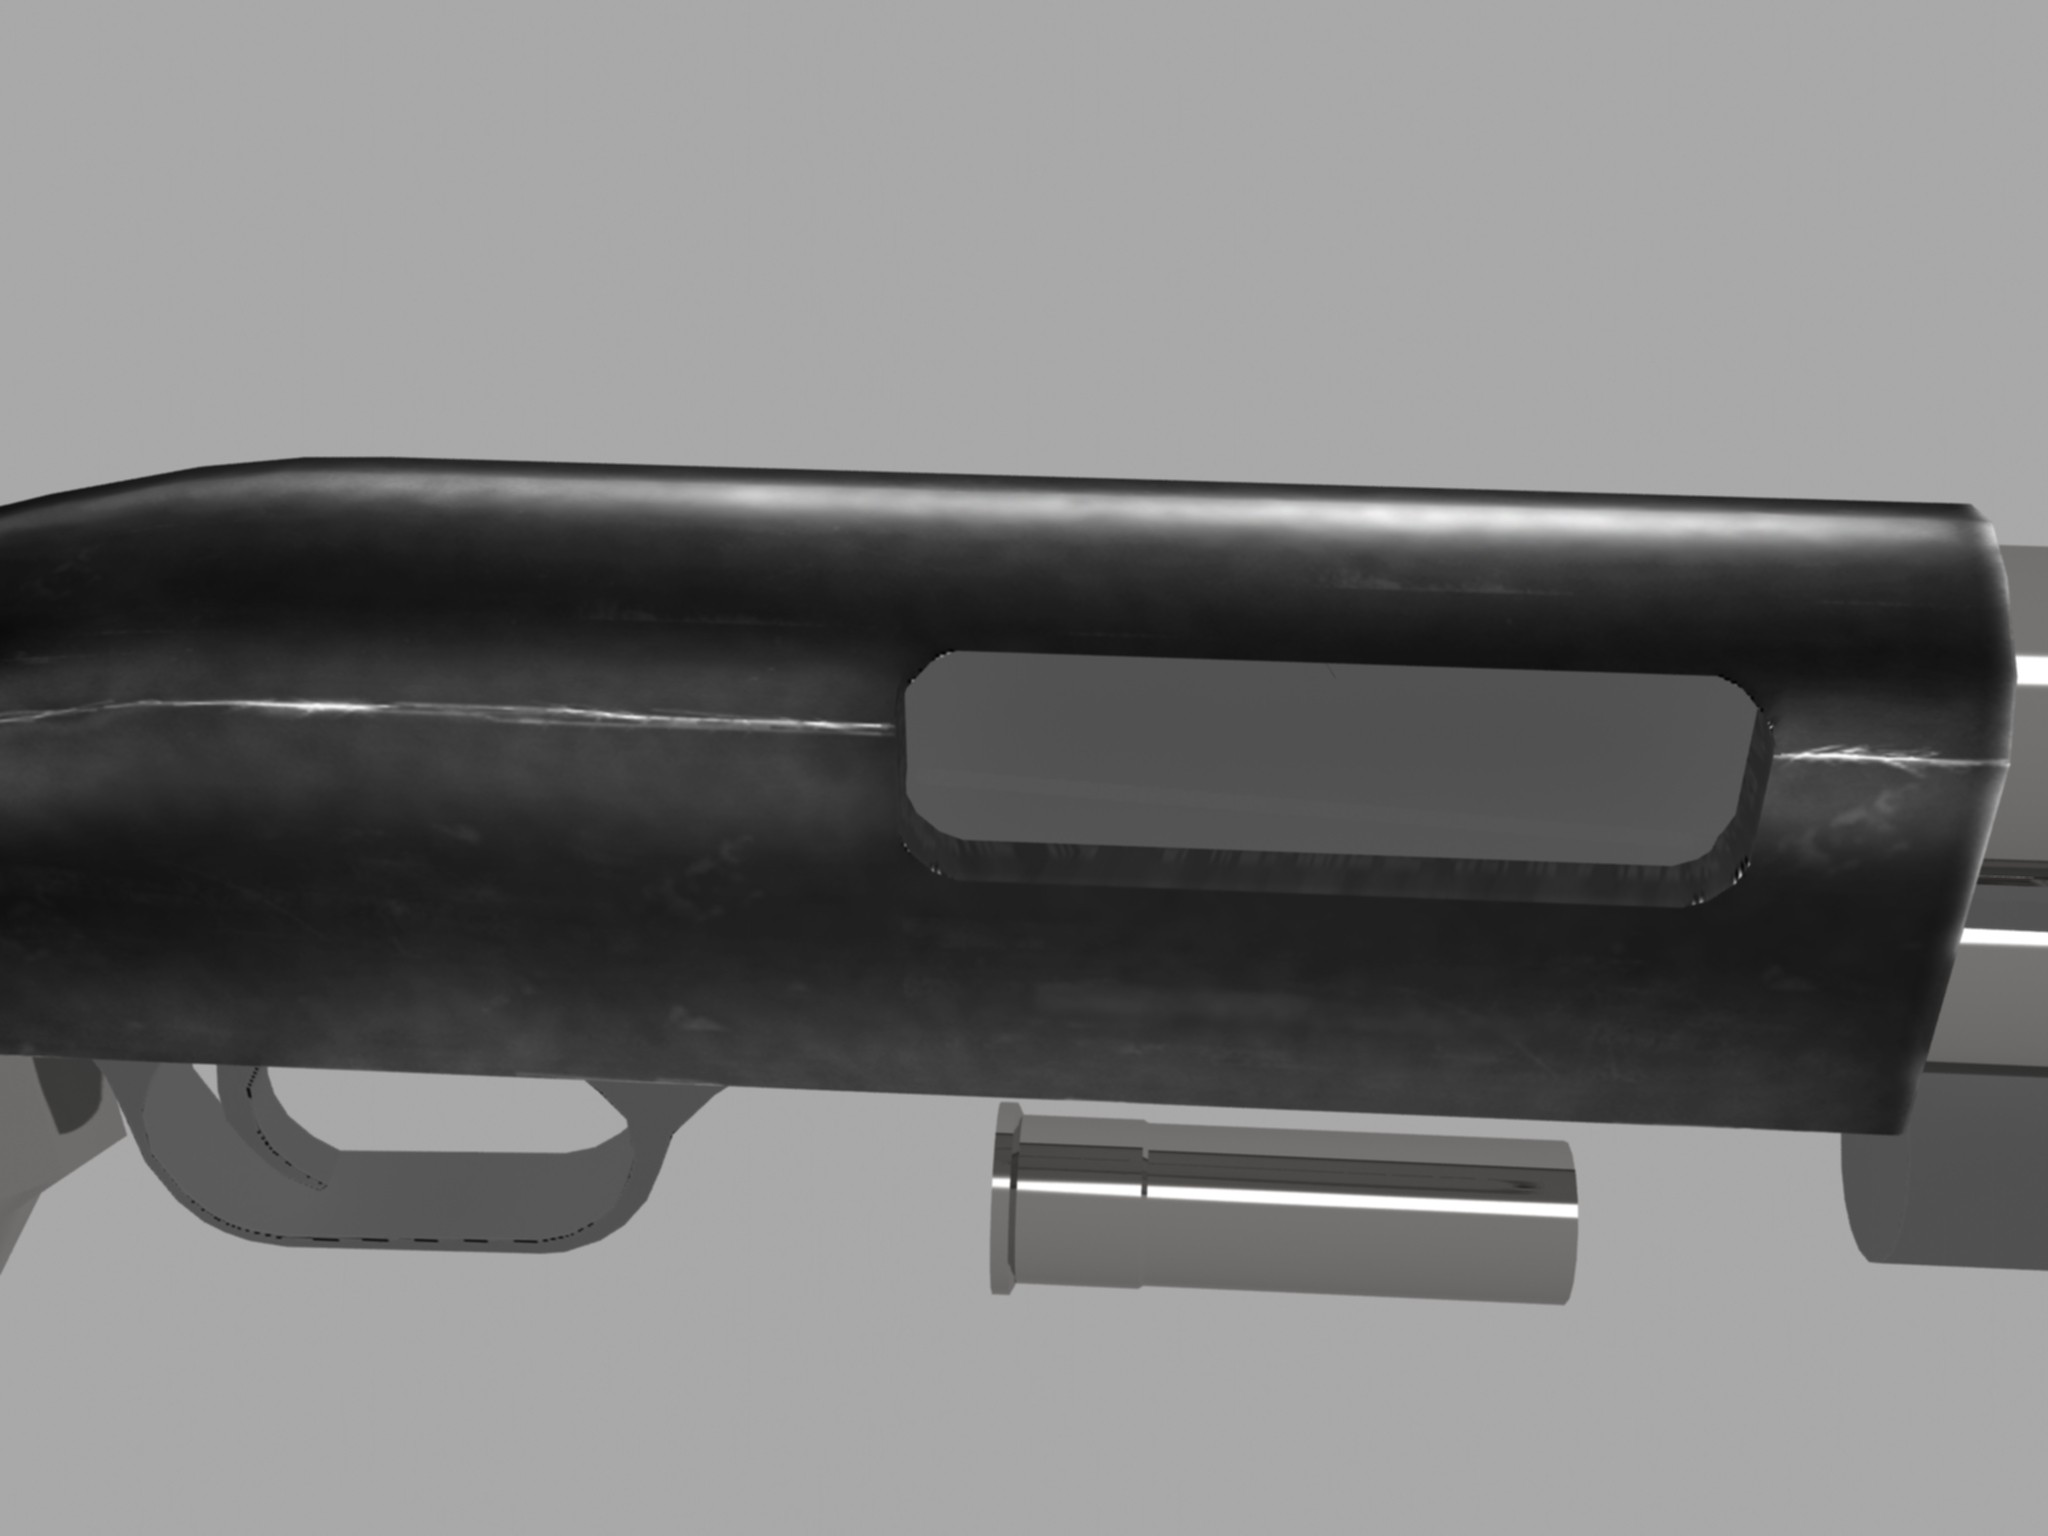 Well few hours ago i saw this beautiful shotgun lying untextured in